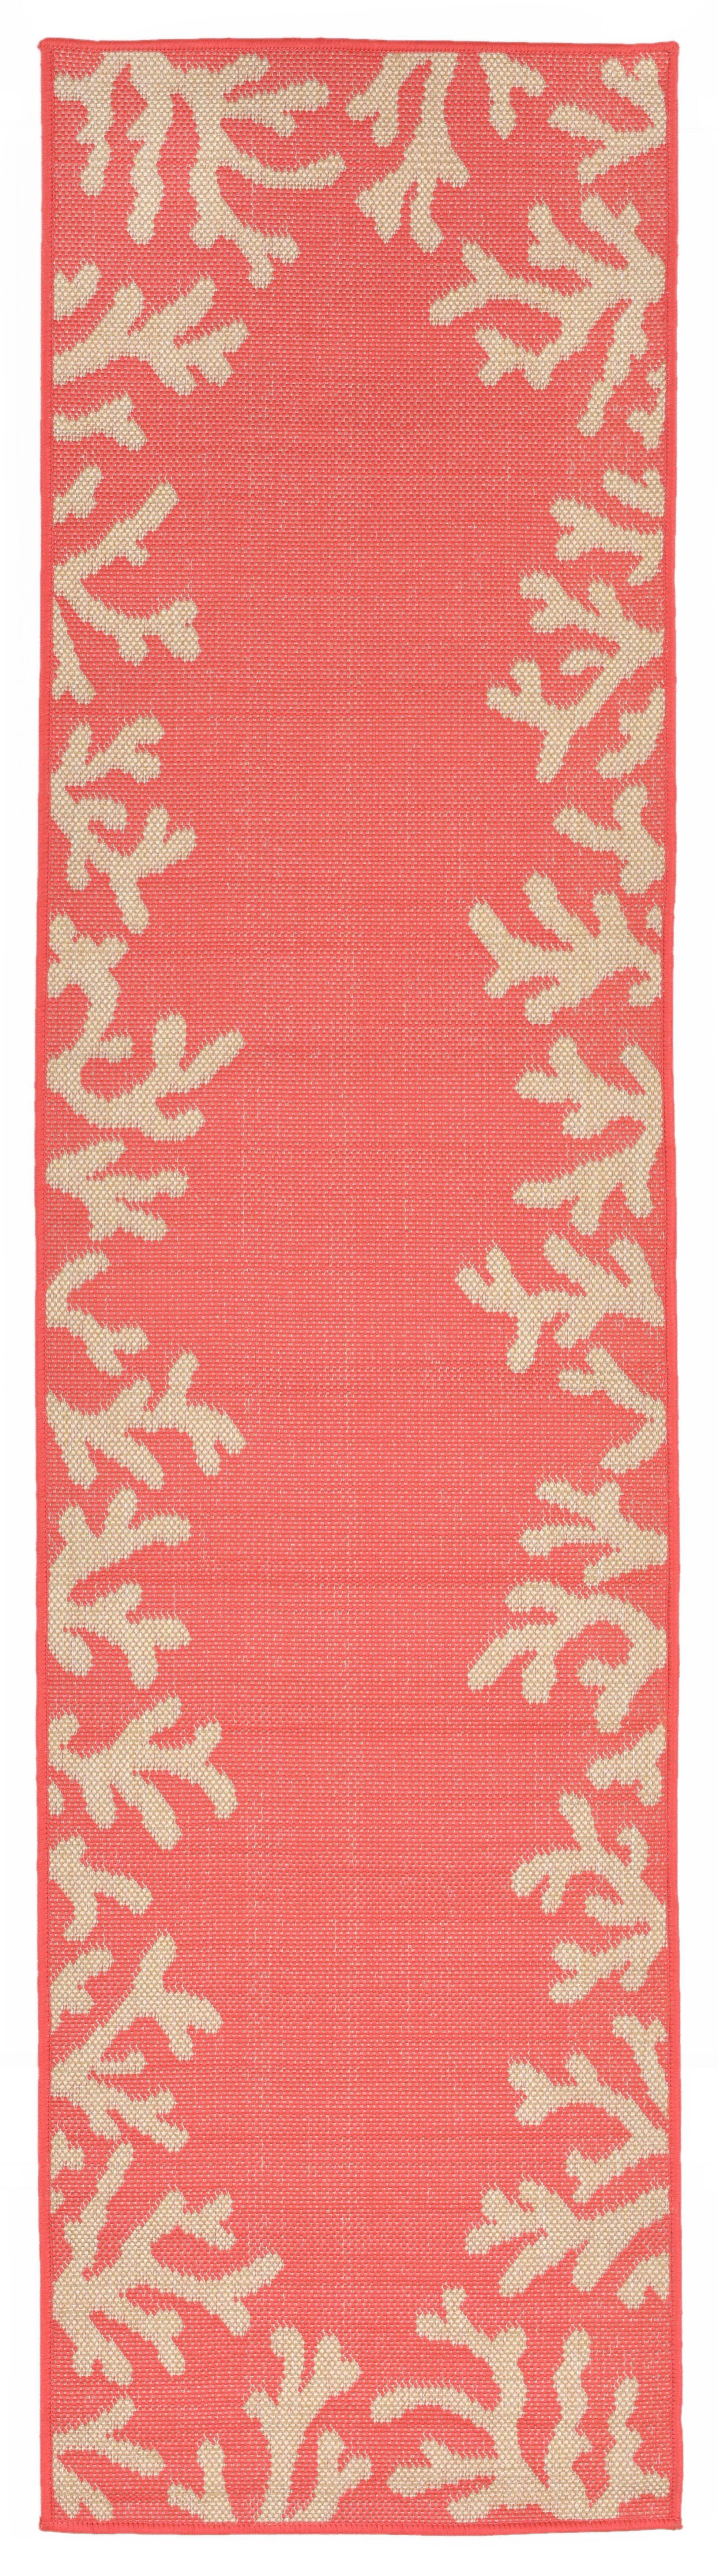 Claycomb Hand-Tufted Orange Indoor/Outdoor Area Rug Rug Size: Runner 2' x 8'